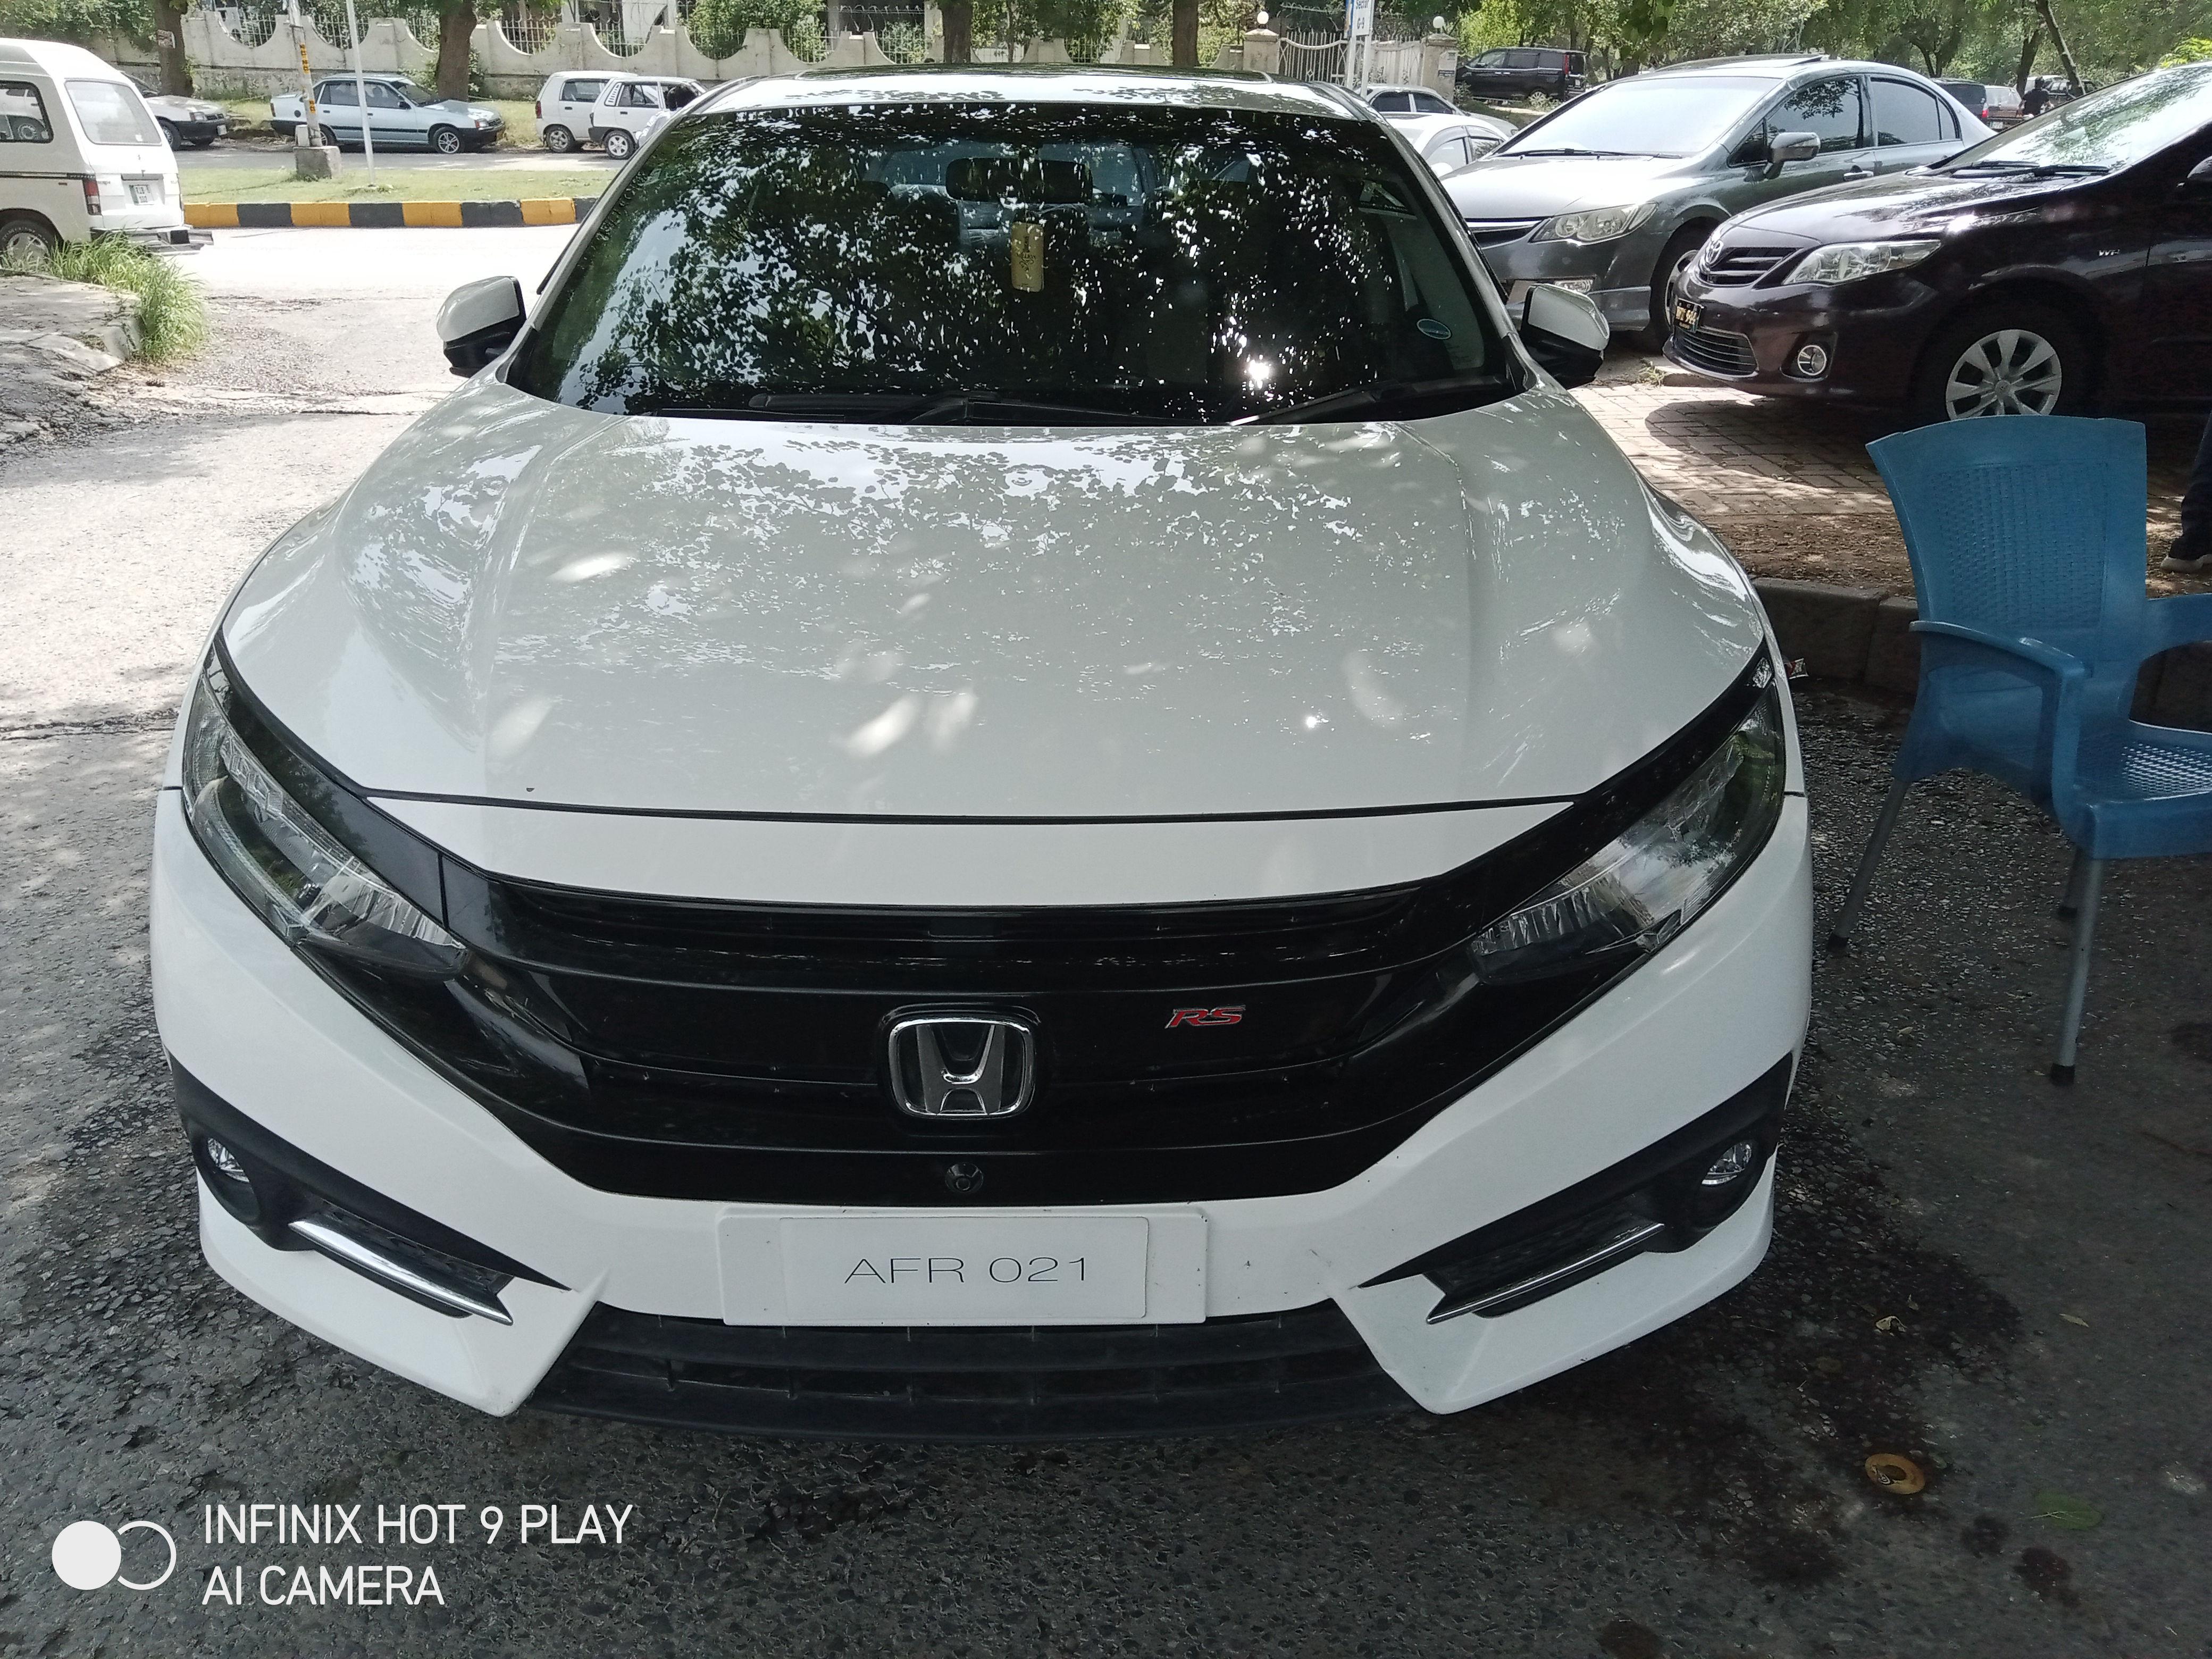 Honda Civic Turbo RS 2020